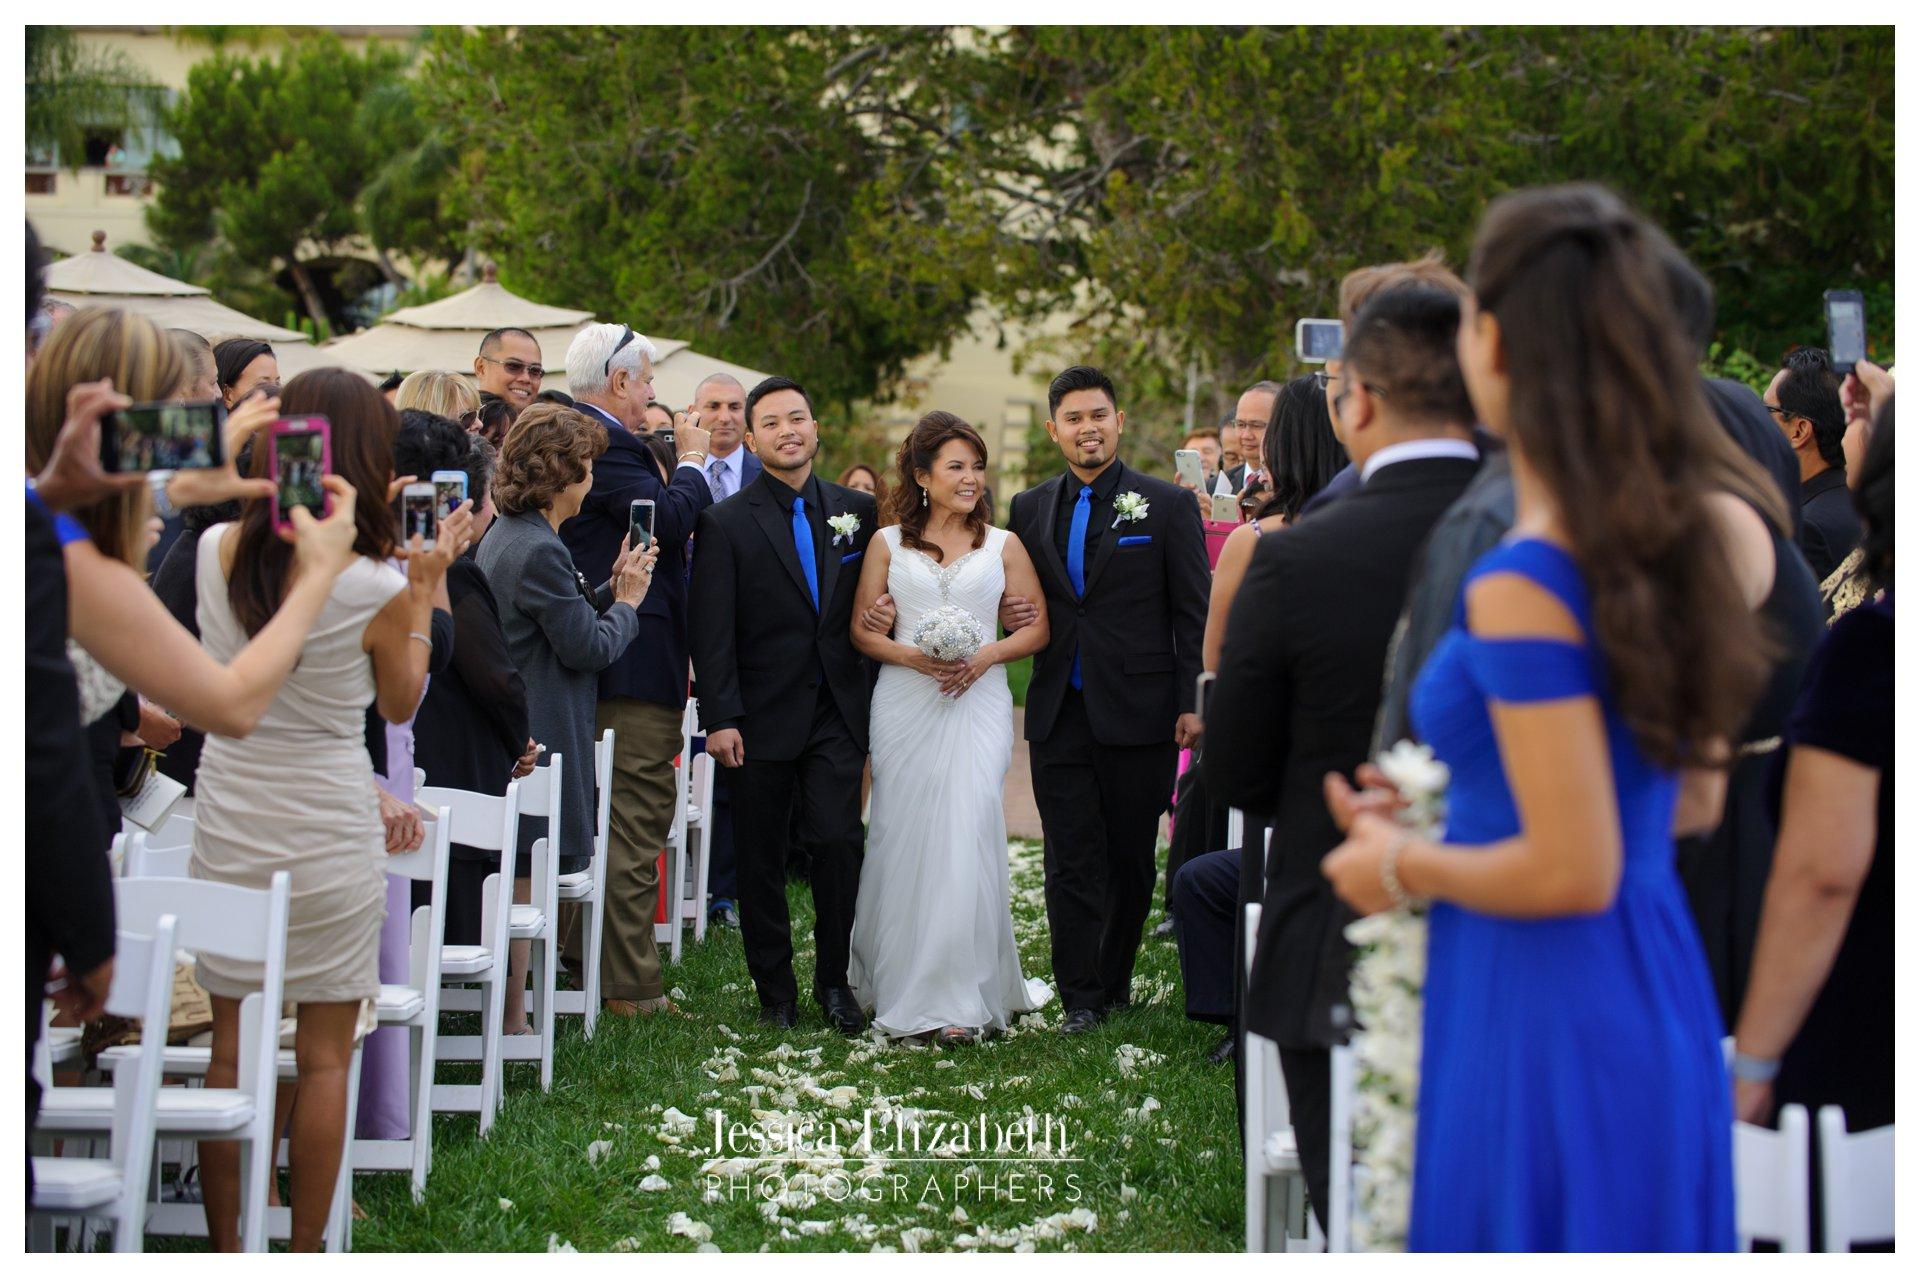 09-Terranea-Palos-Verdes-Wedding-Photography-by-Jessica-Elizabeth-w.jpg